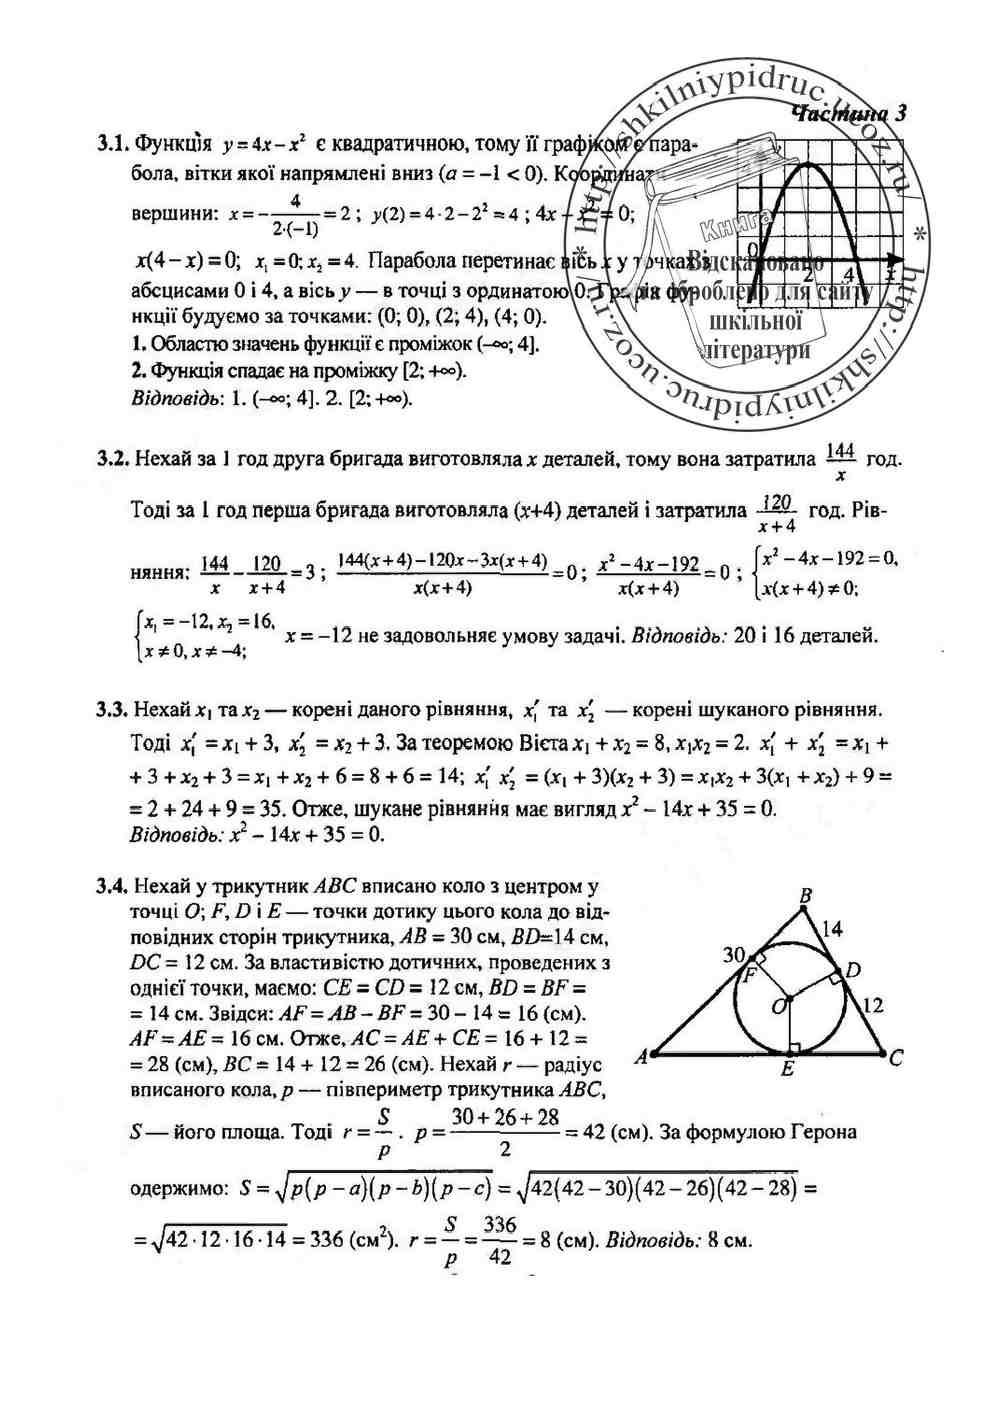 мерзляк математика а.г 2019 дпа 9 класс решебник